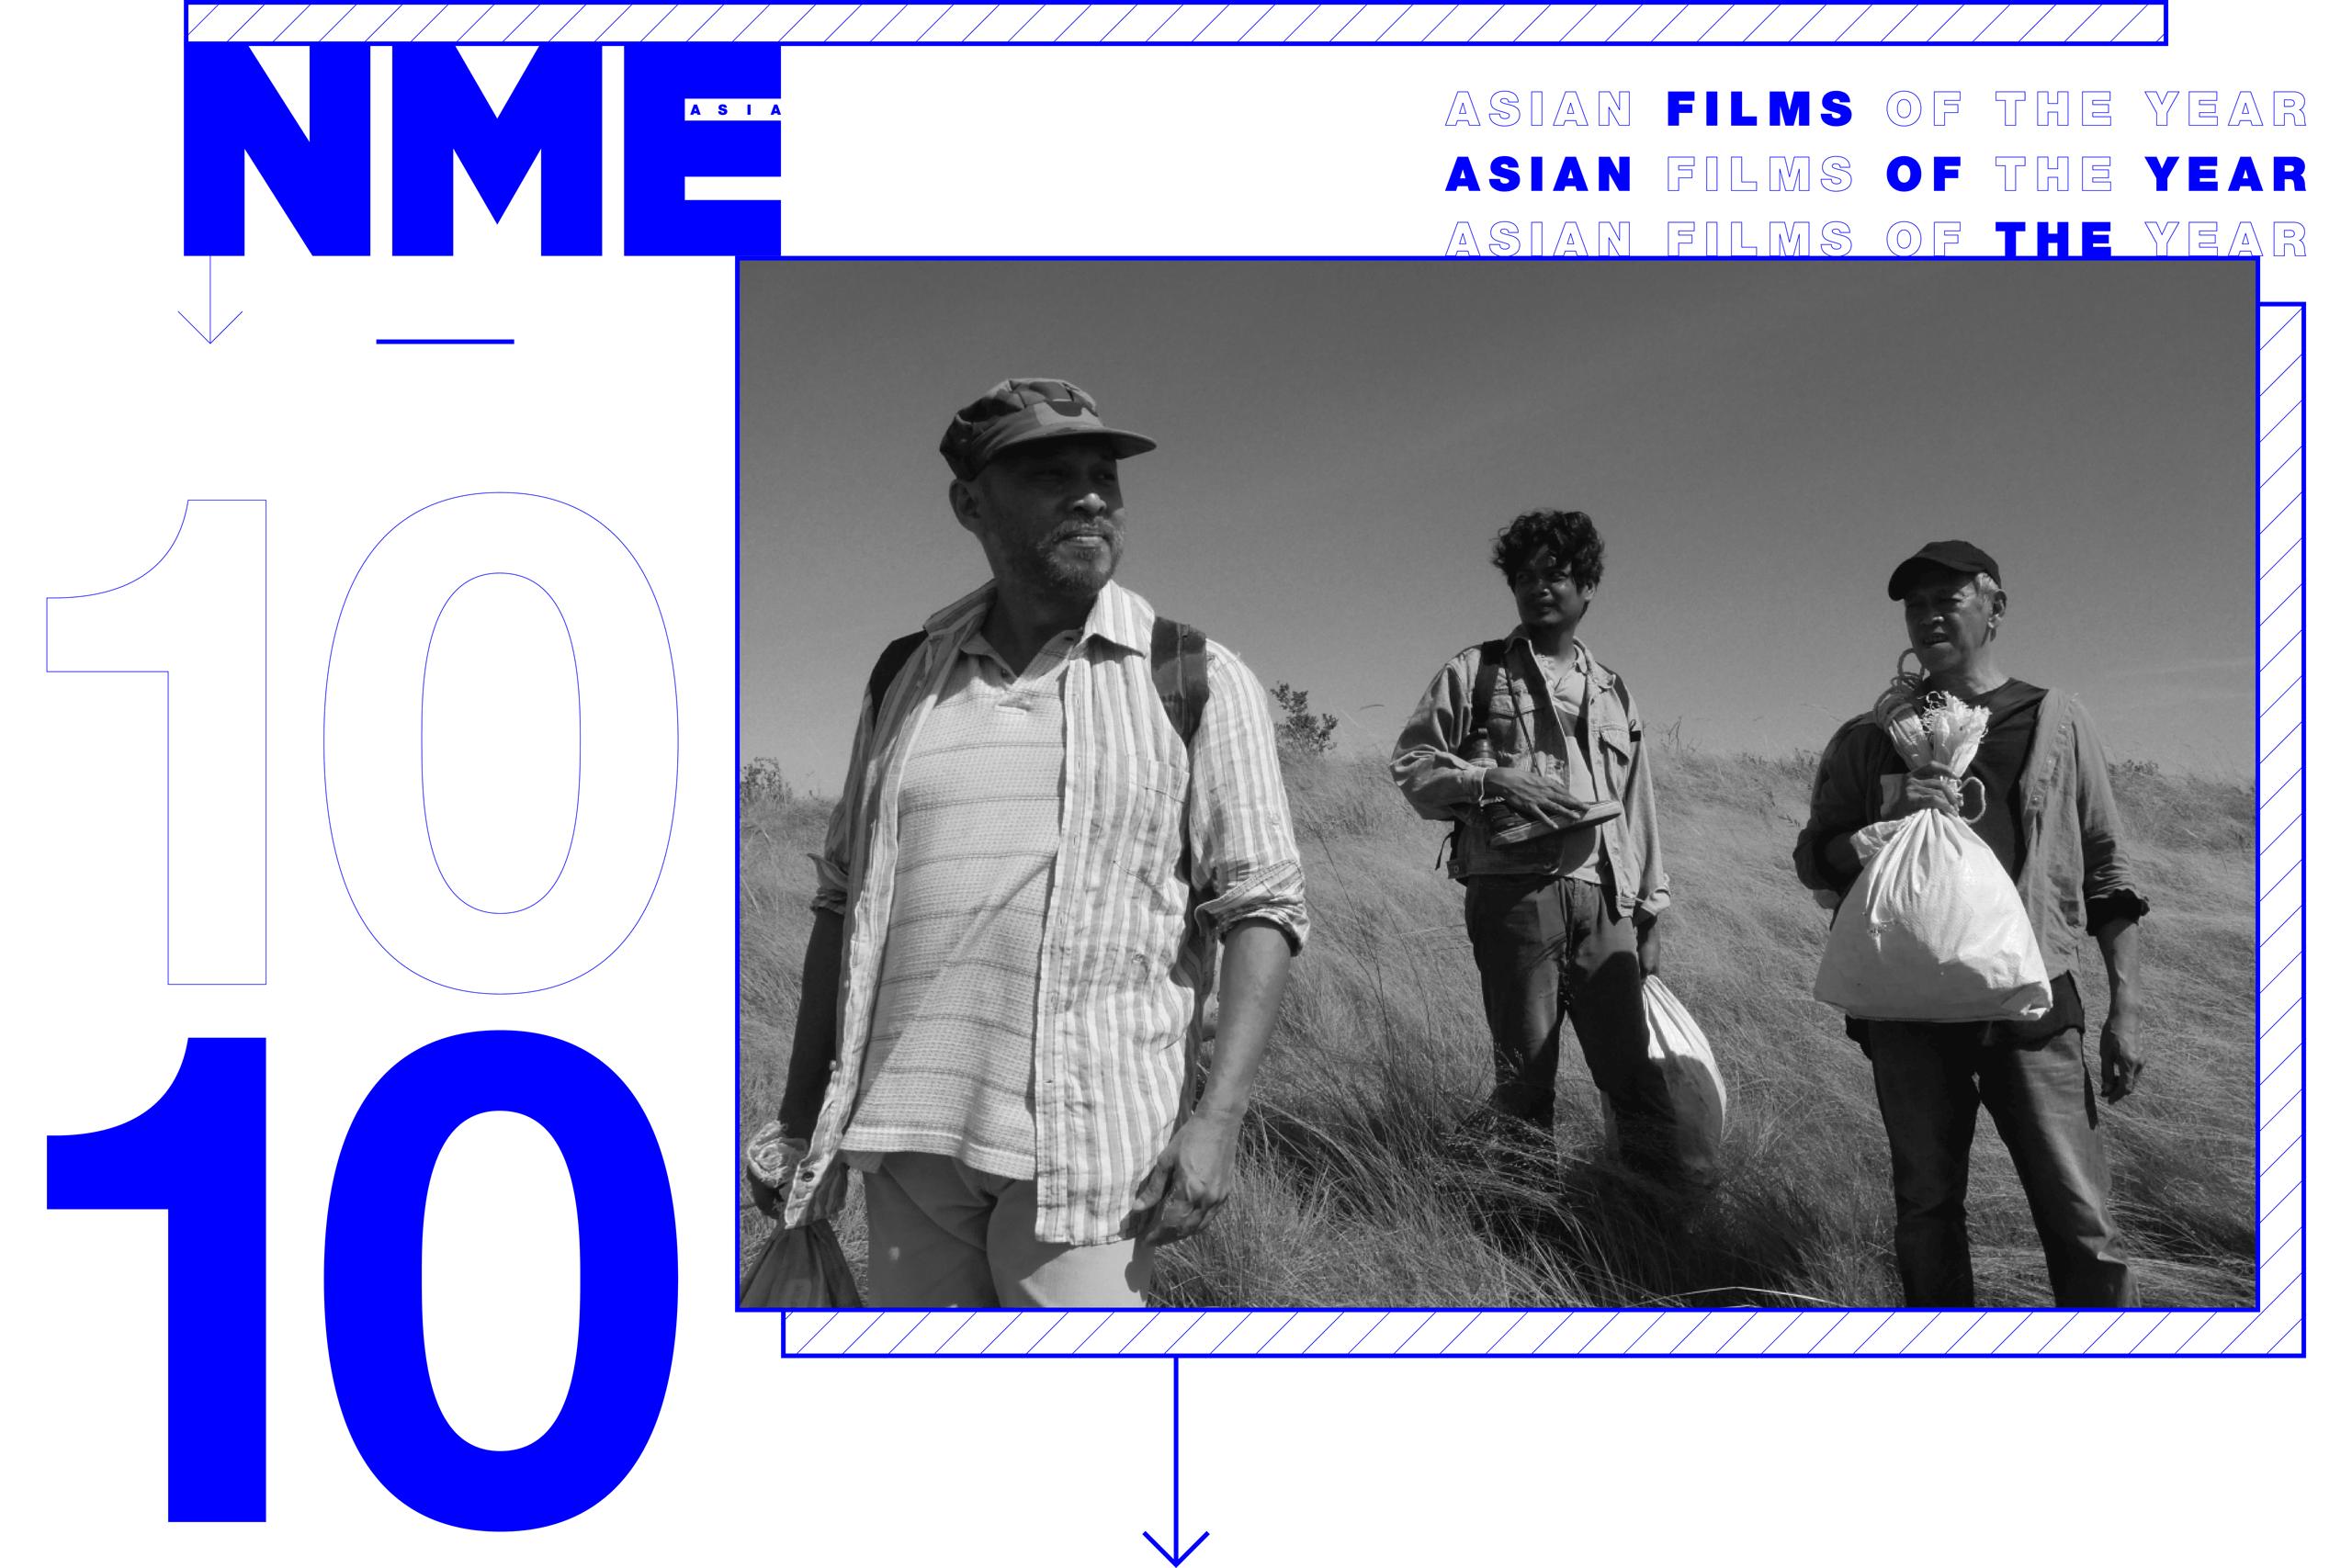 NME Asian Films Of The Year Genus Pan